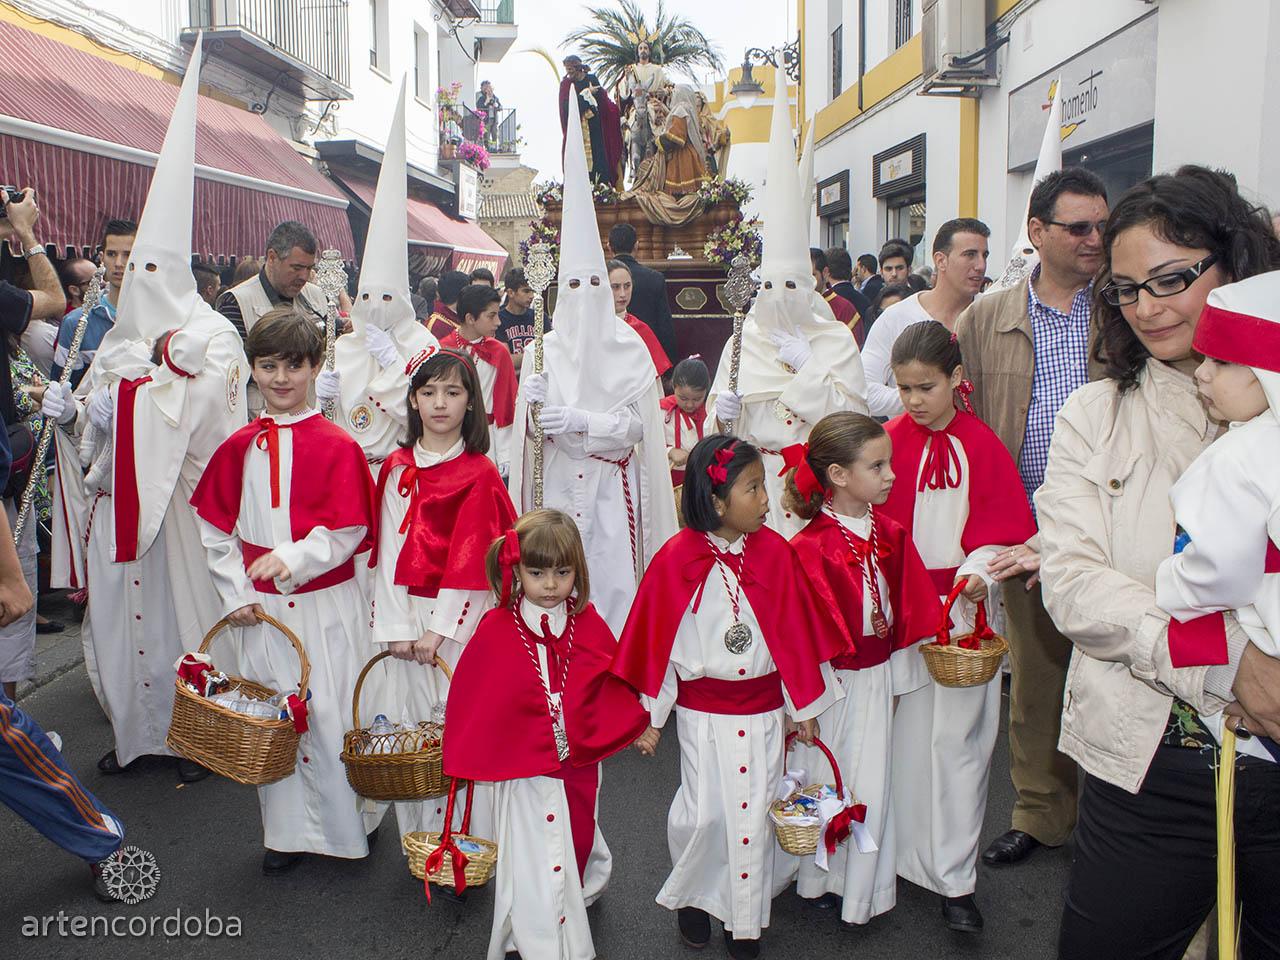 Esclavinas de la Hermandad de la Entrada Triunfal (Borriquita) en Córdoba